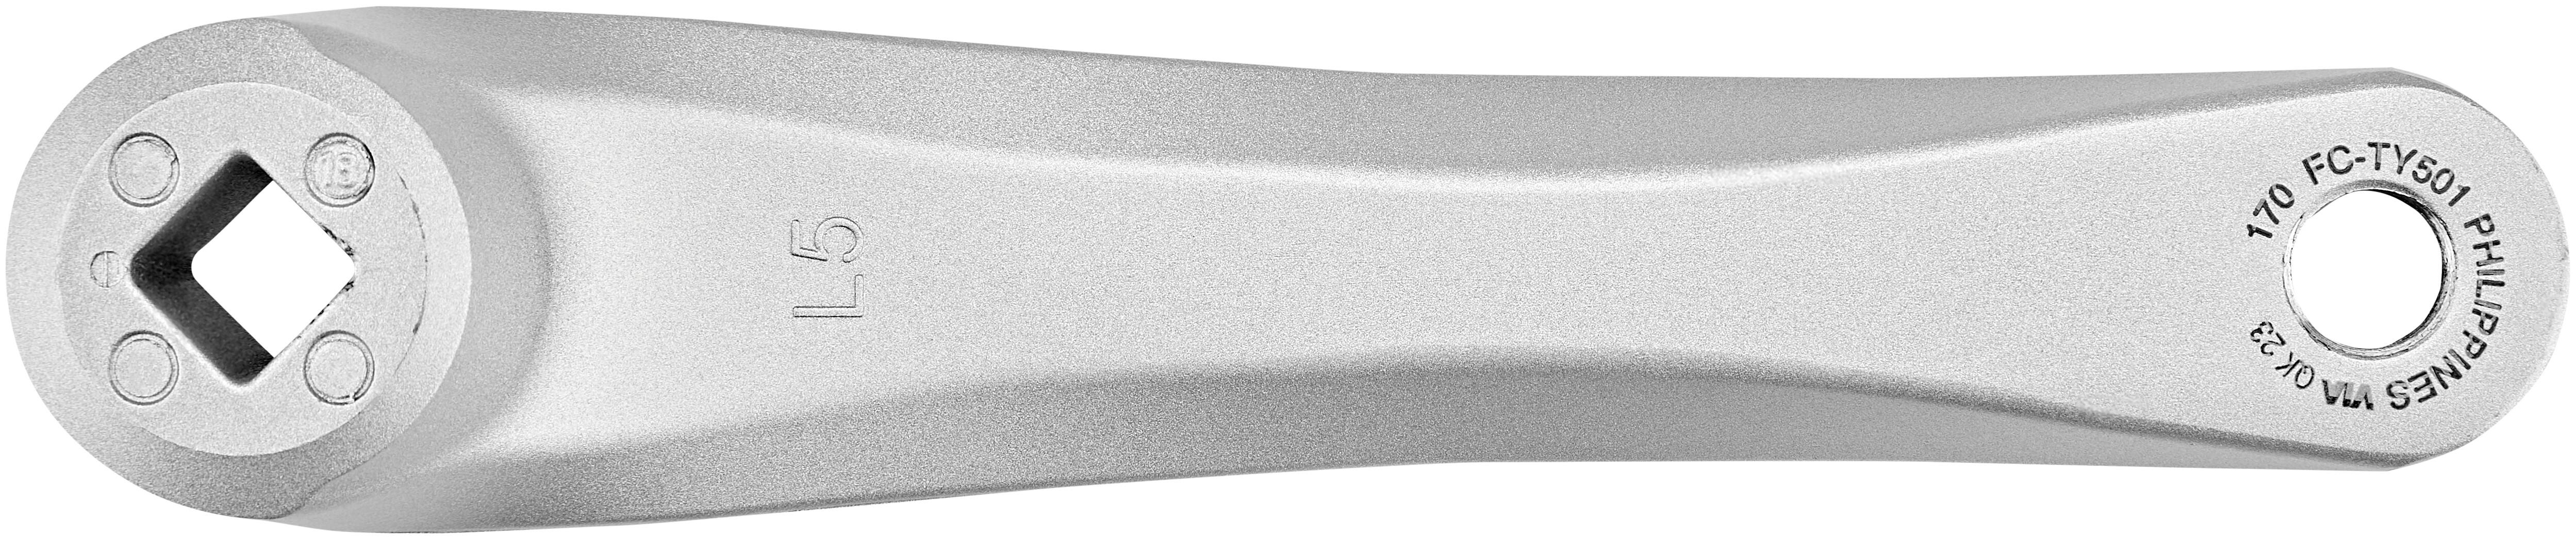 Shimano efcty 501e888clb Pédalier TY 501 48//38//28 175 mm FC-TY 501 4 pans 6